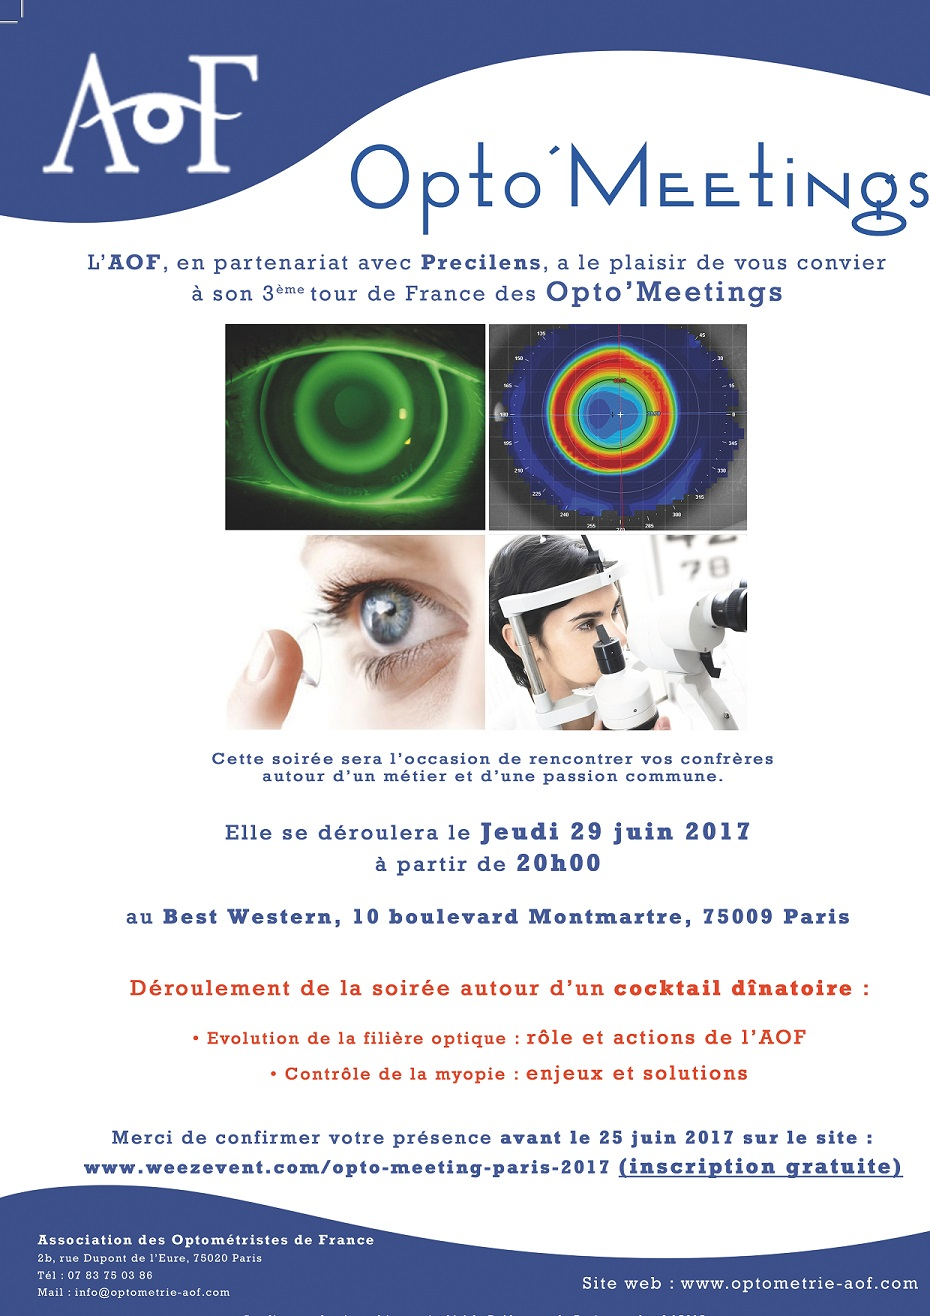 OPTO'MEETING PARIS, INSCRIPTION GRATUITE.